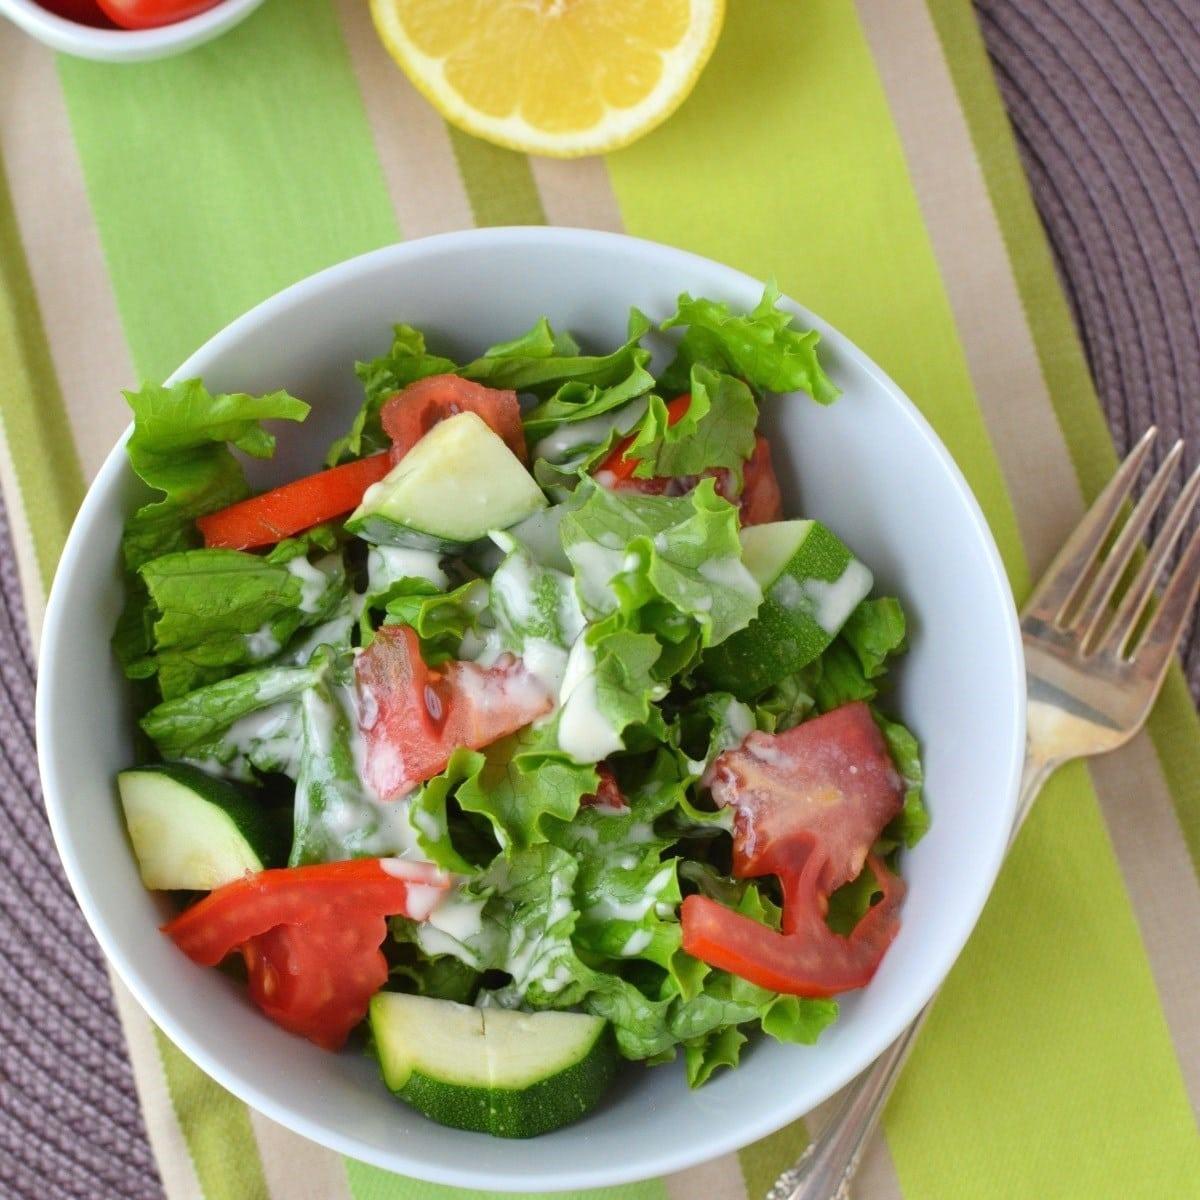 Paleo salad dressing